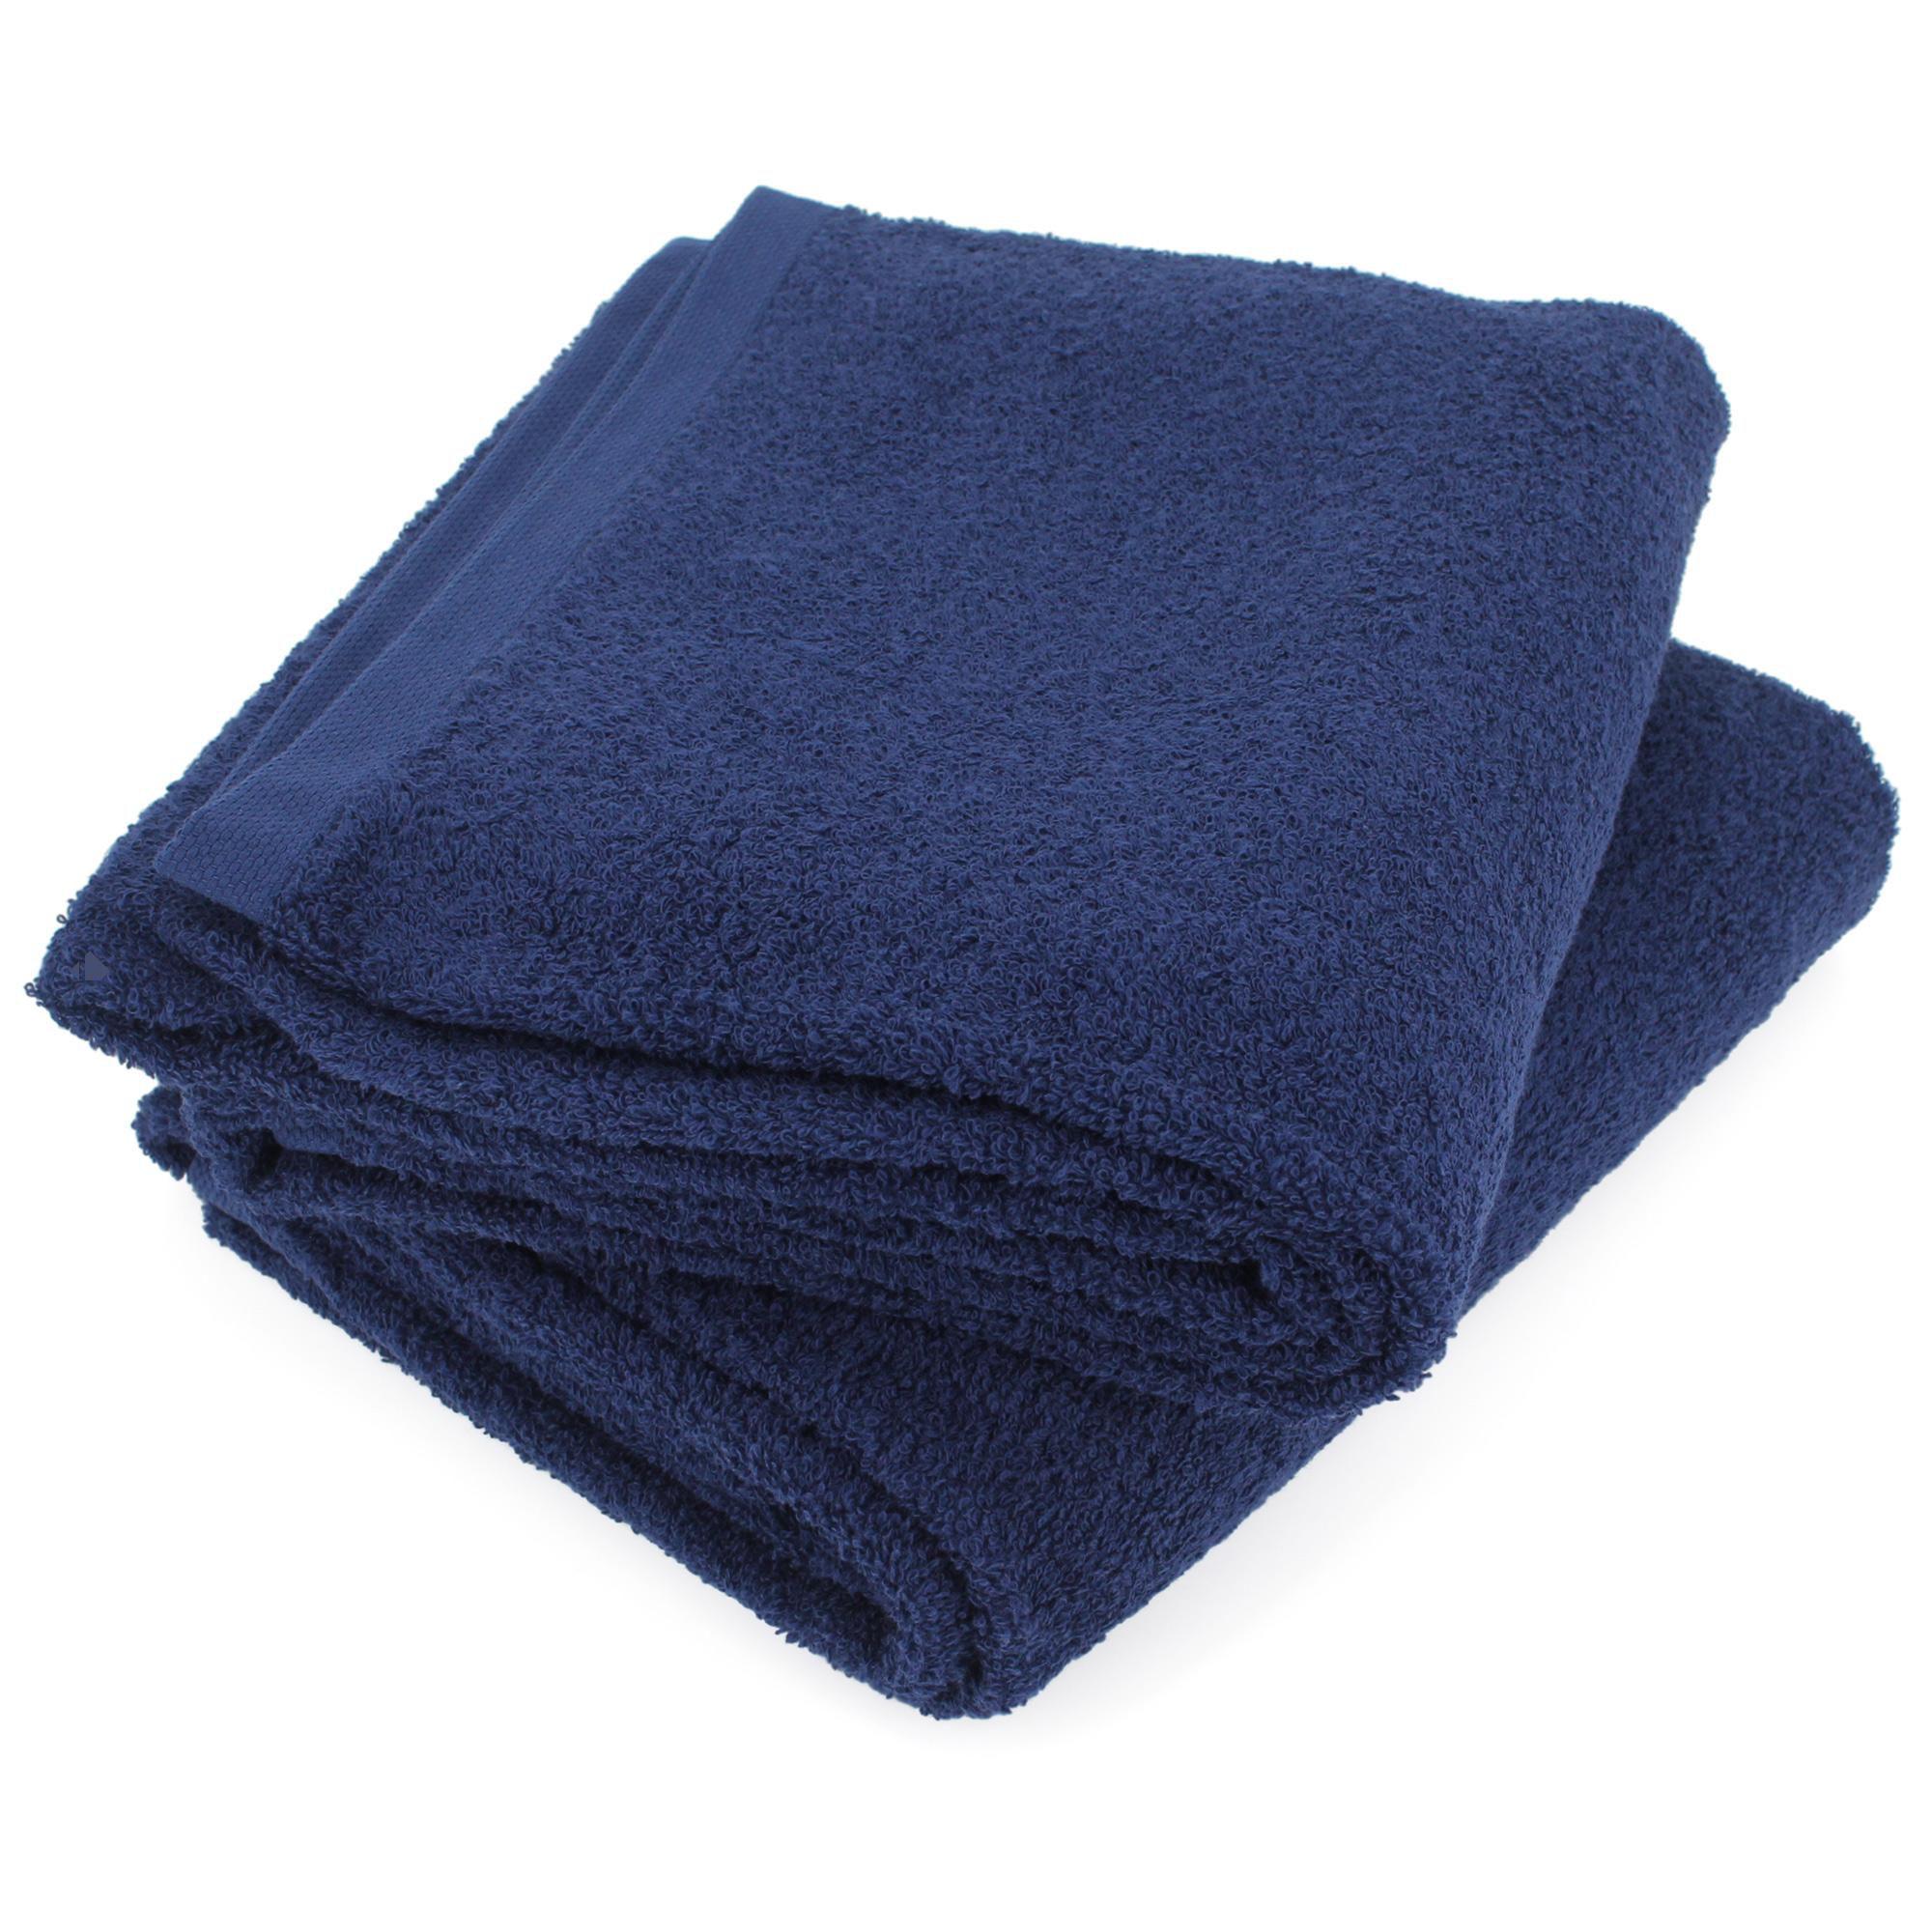 Lot de 2 draps de bain 90x150 cm ALPHA bleu Marine Bleu